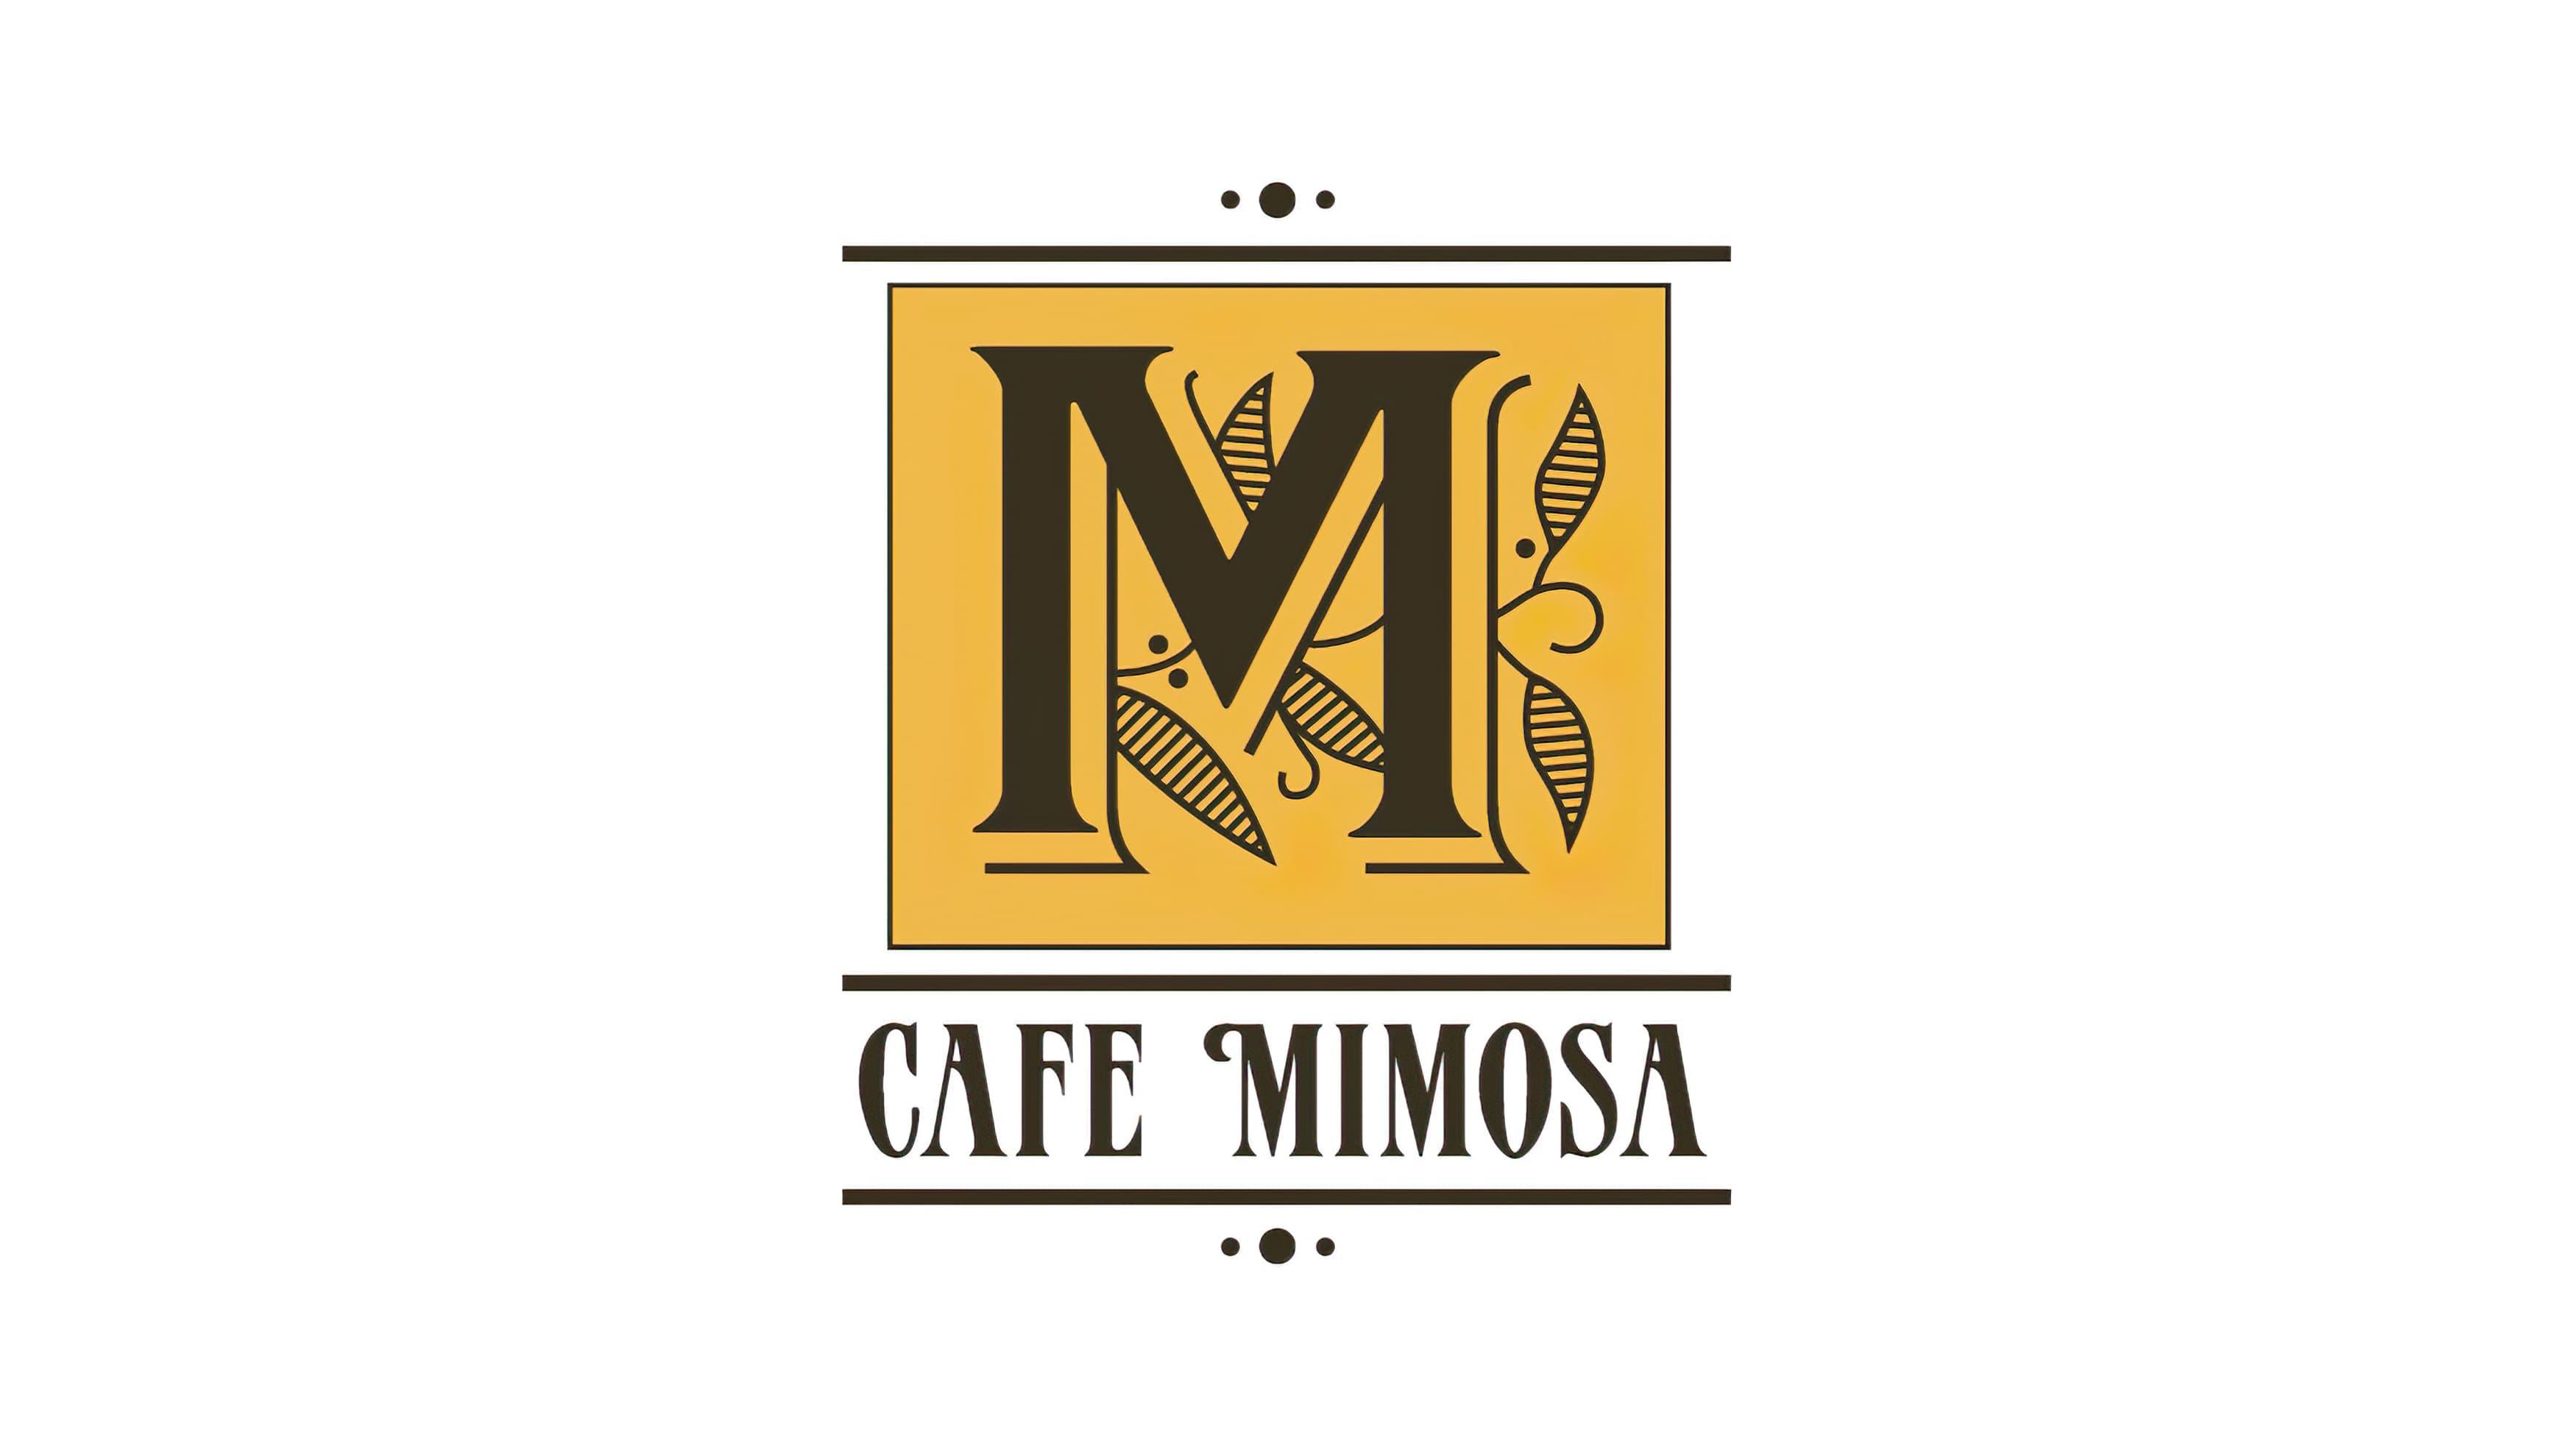 The Cafe Mimosa brand logo mark designed by RSSM Design